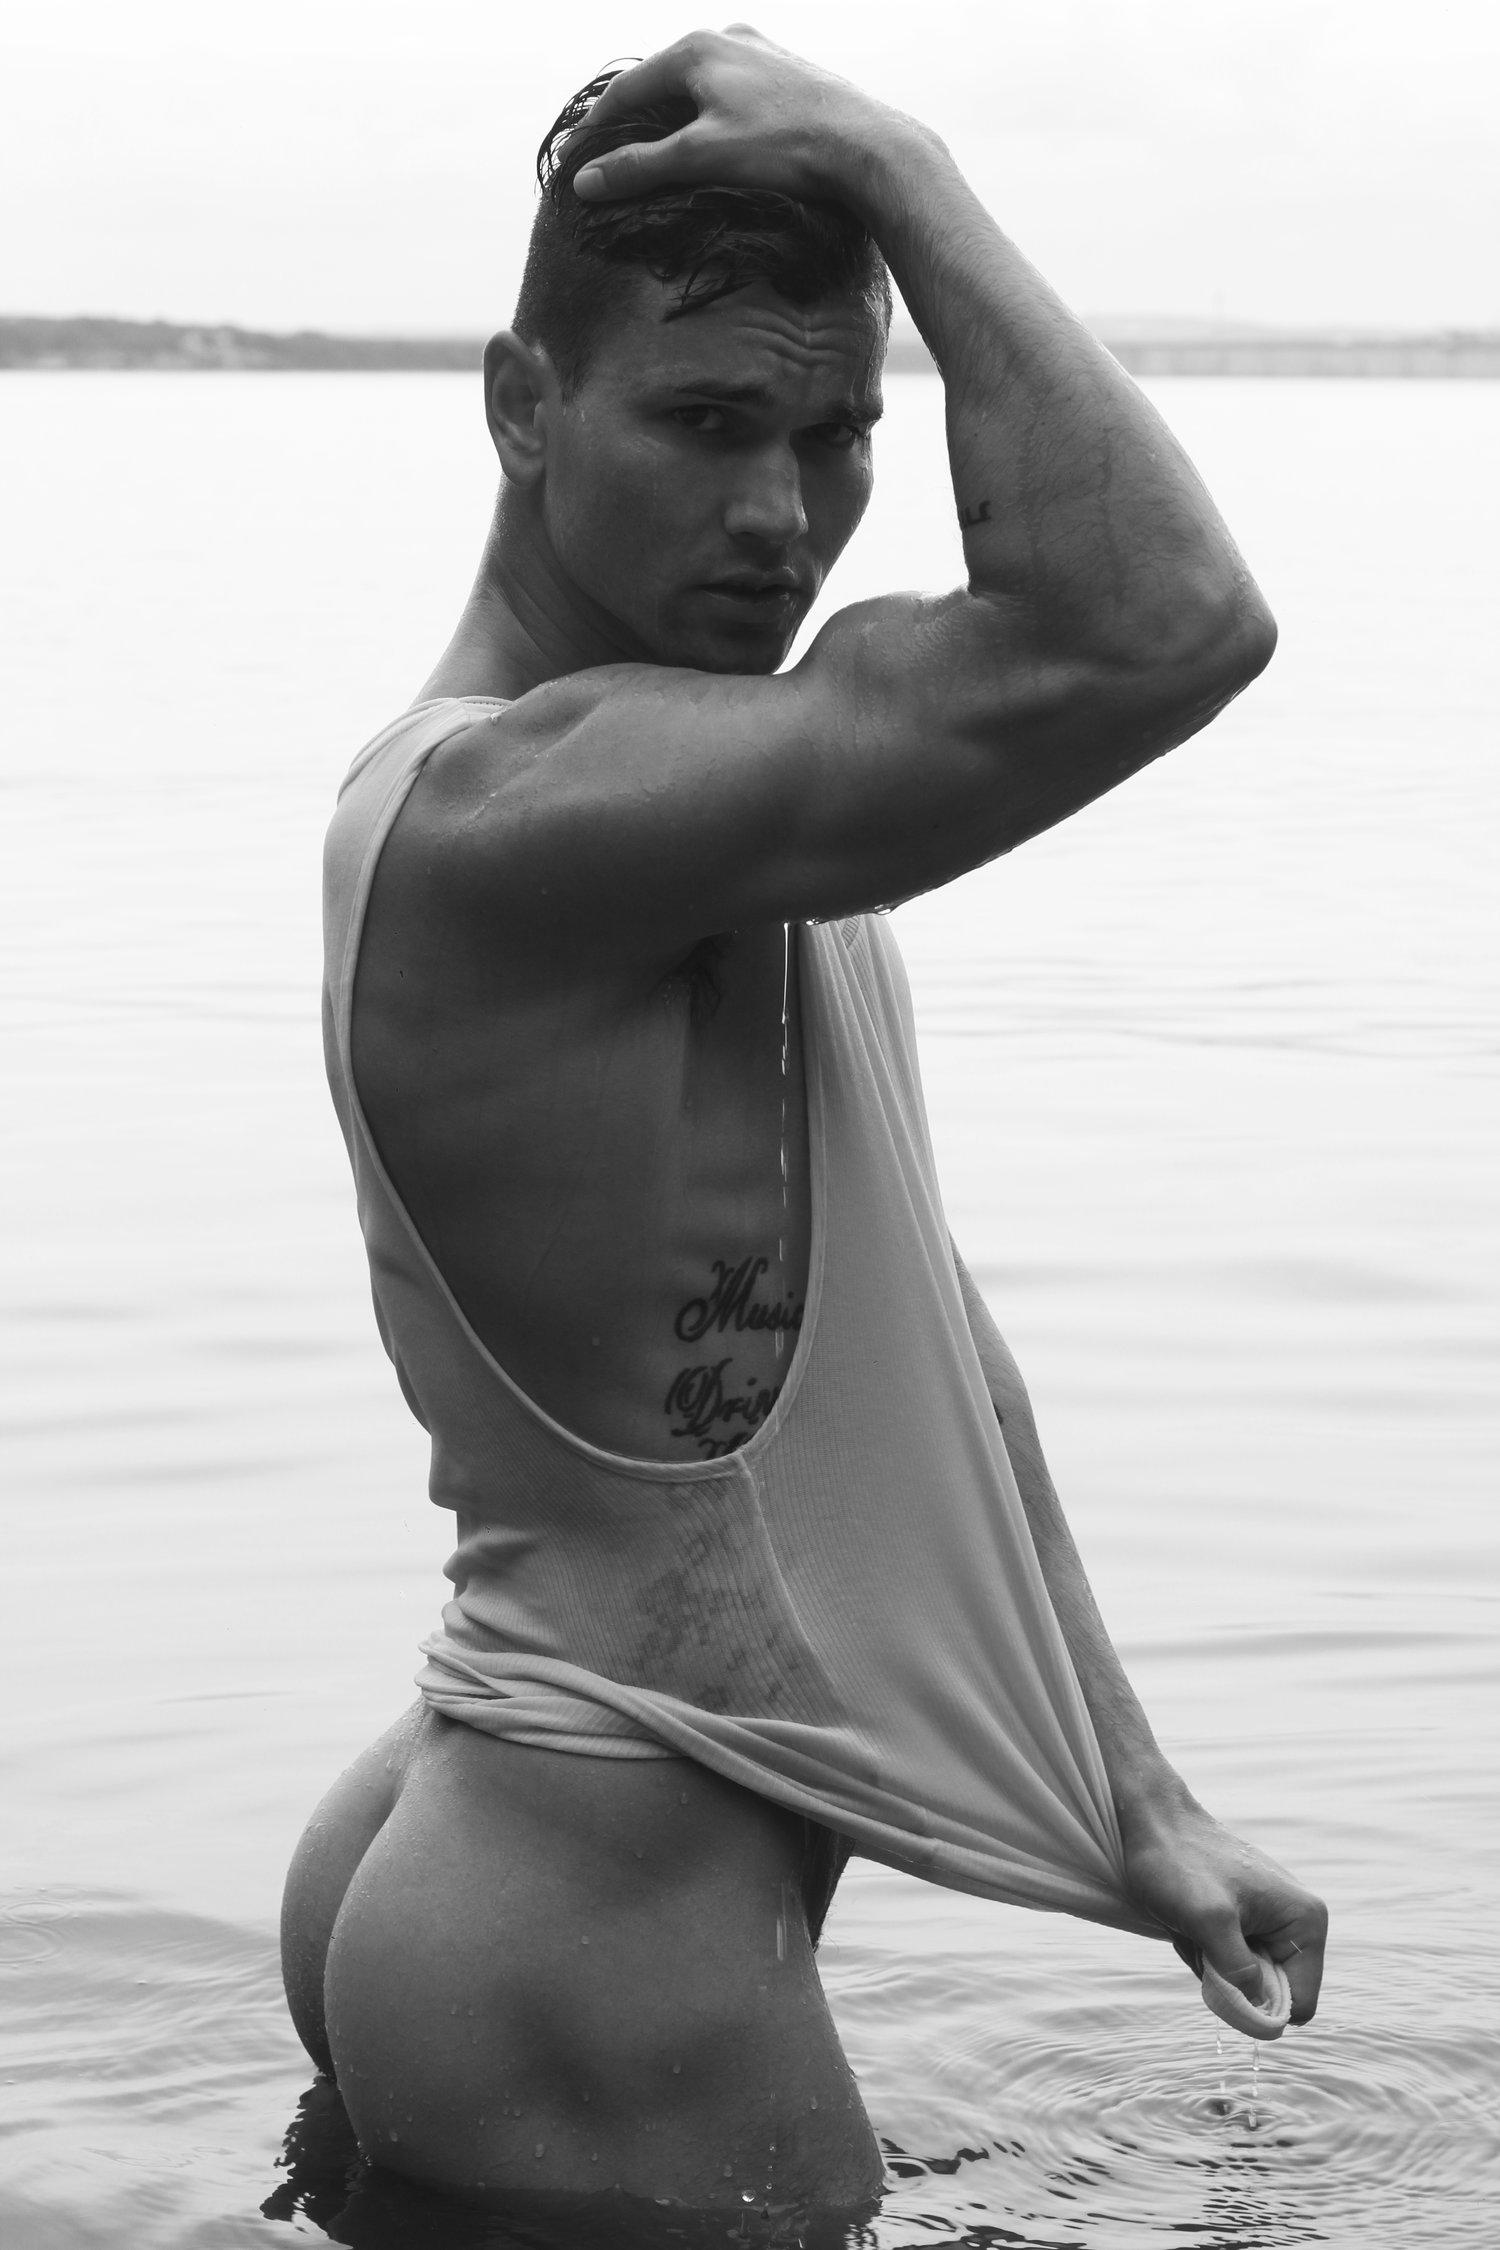 Adon Exclusive: Model Jonathan Ackley By Ricardo Ayala